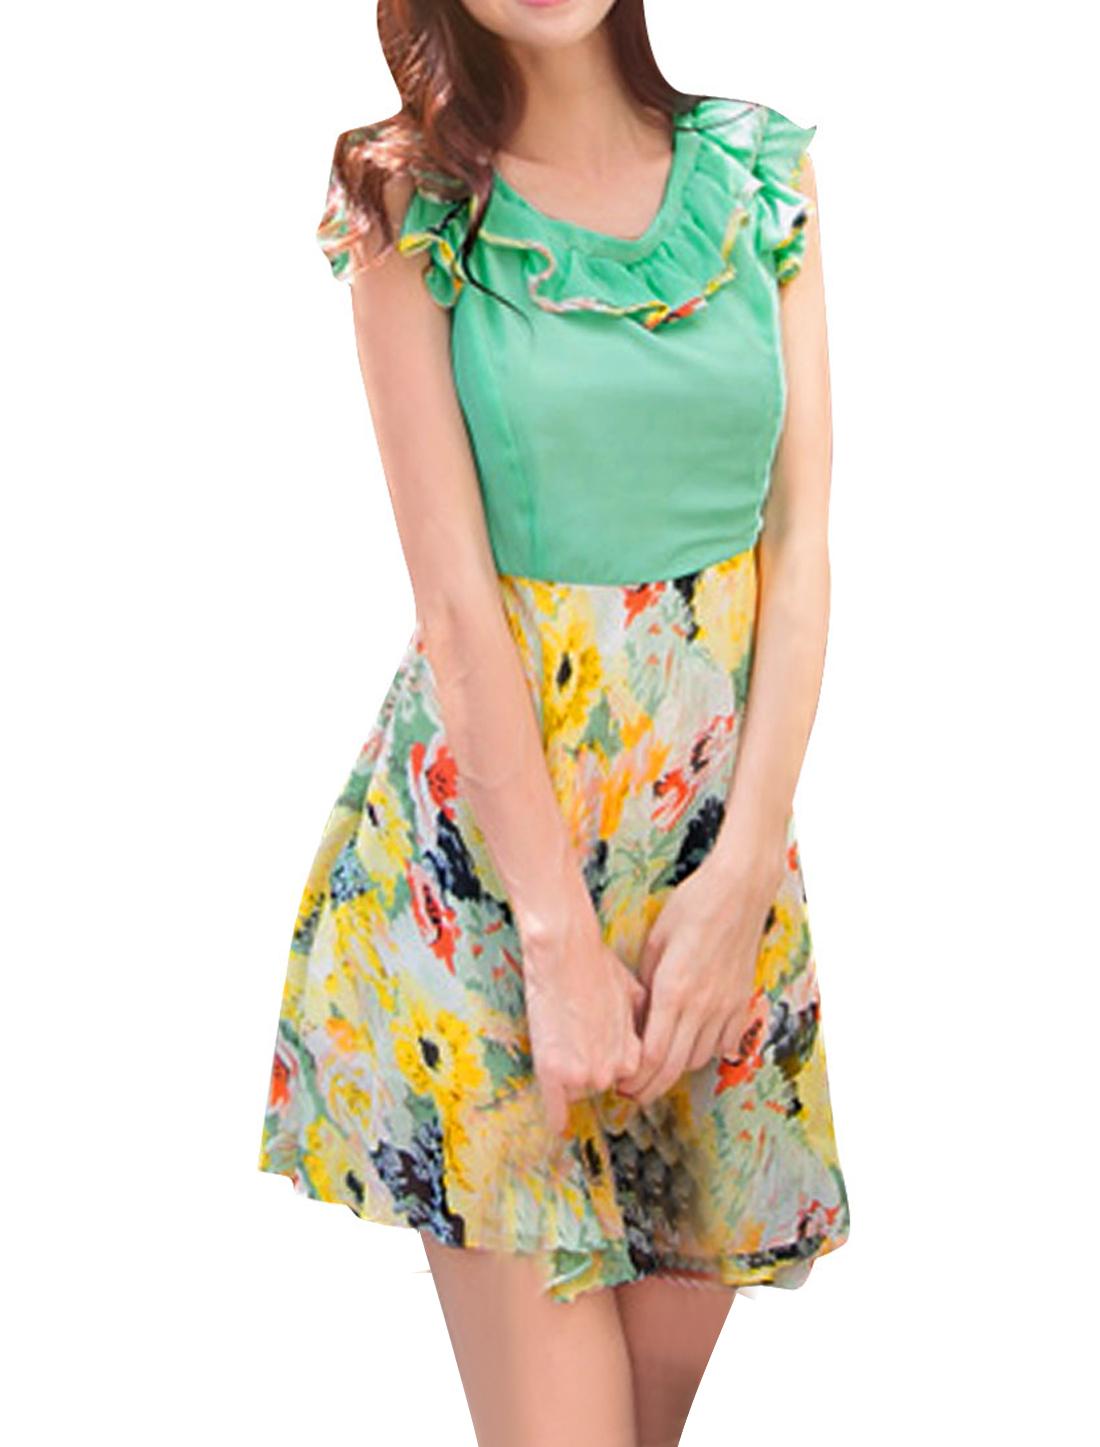 Scalloped Irregular Hem Multicolor Stylish Chiffon Dress for Women Green S